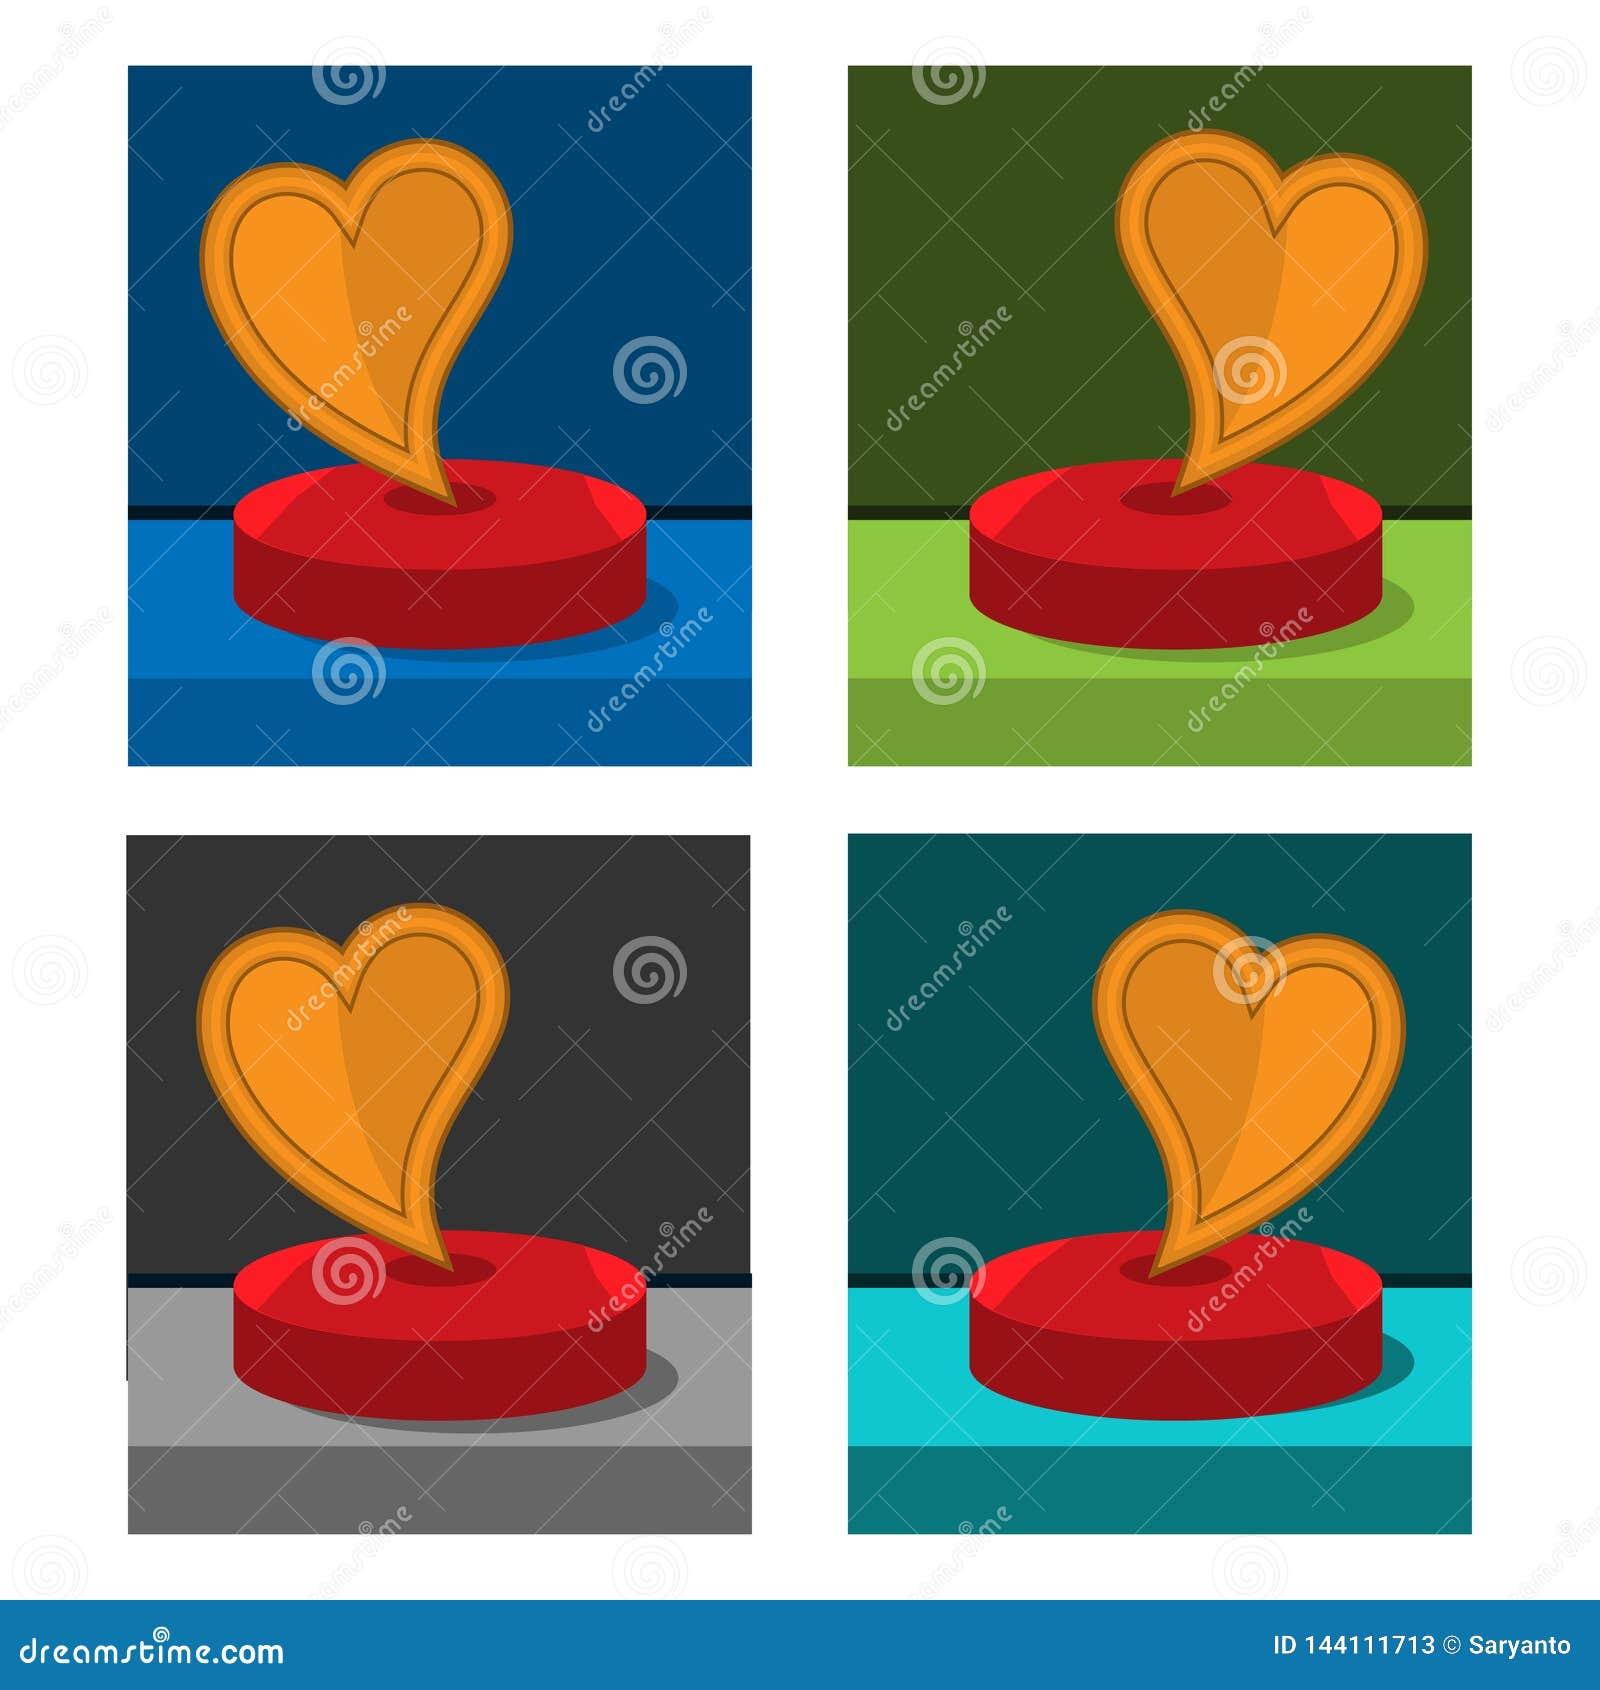 Love icon on the circle, stock icon